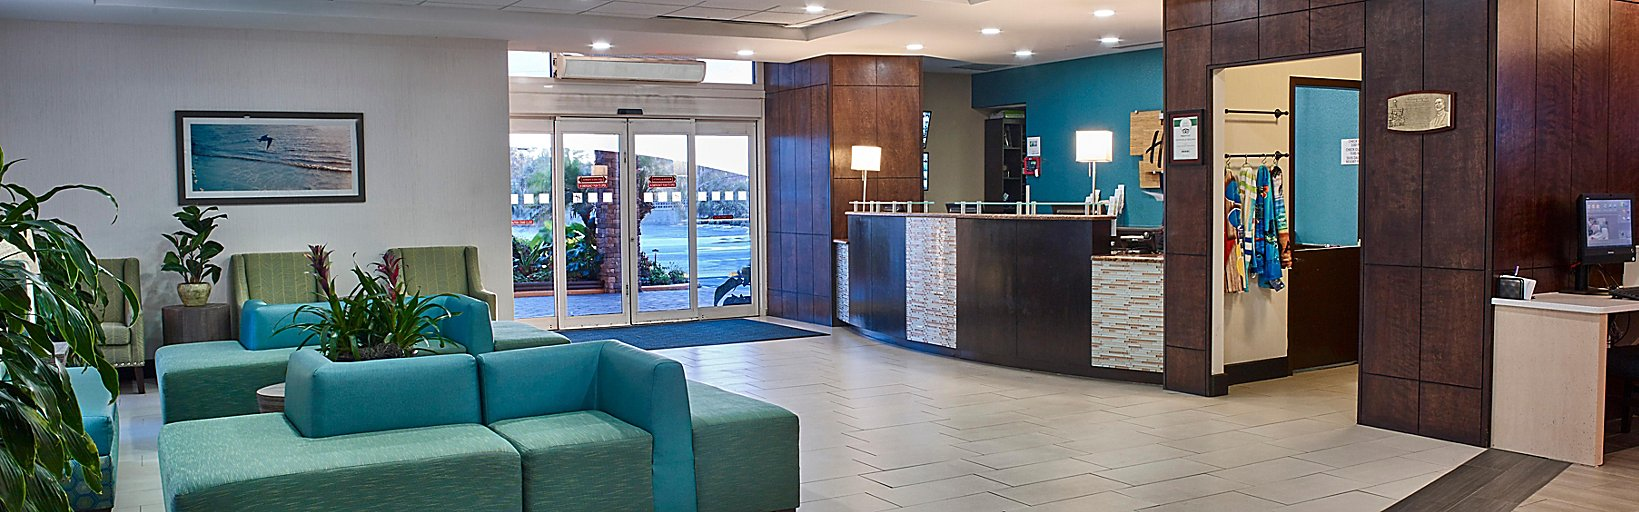 Superb Hotel In Daytona Beach Holiday Inn Resort Daytona Beach Forskolin Free Trial Chair Design Images Forskolin Free Trialorg